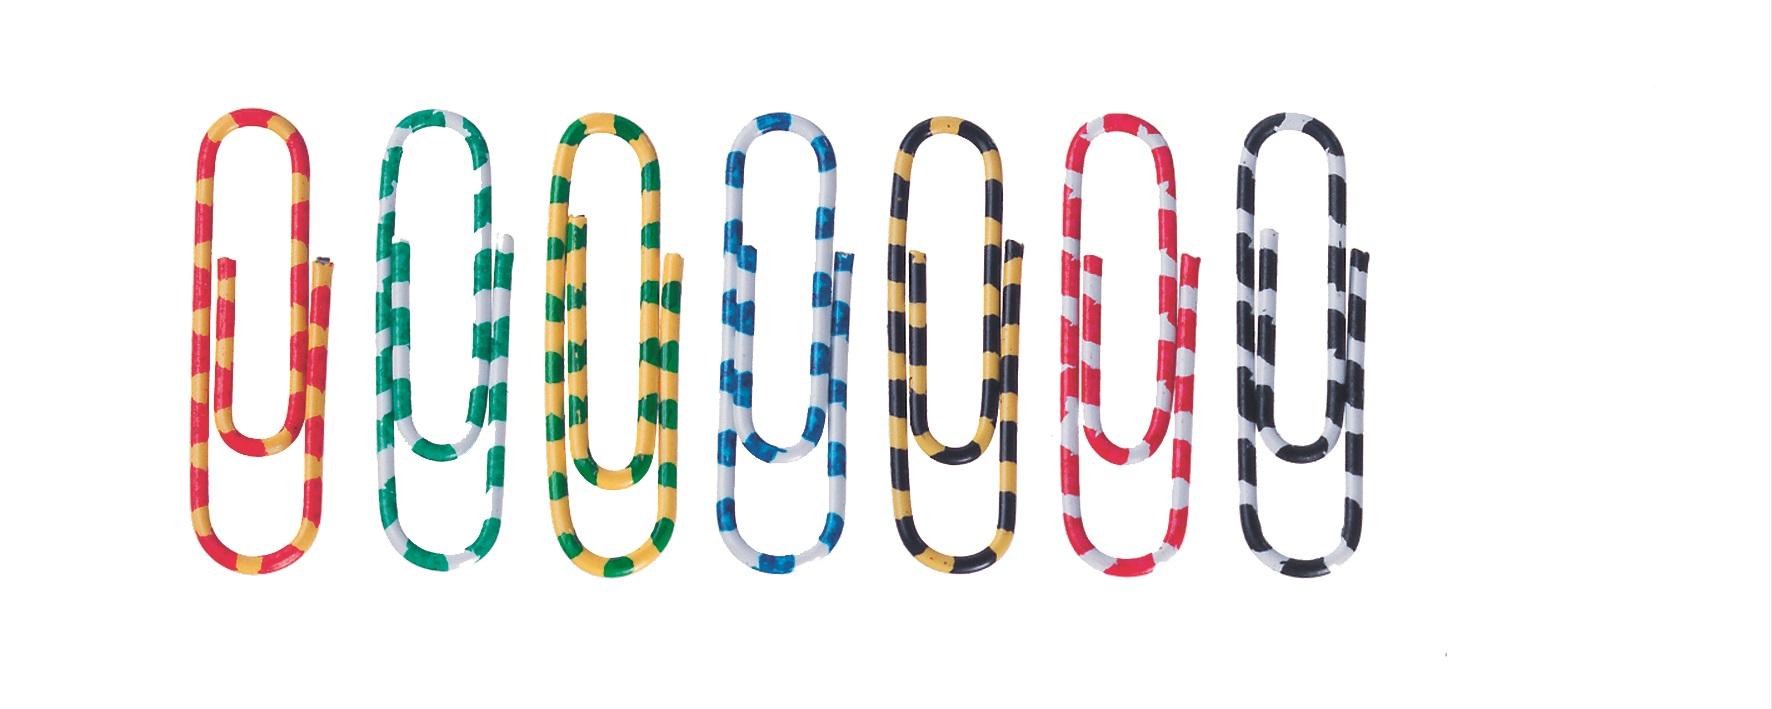 Agrafe colorate 28 mm, 100/cutie, Alco Zebra - asortate